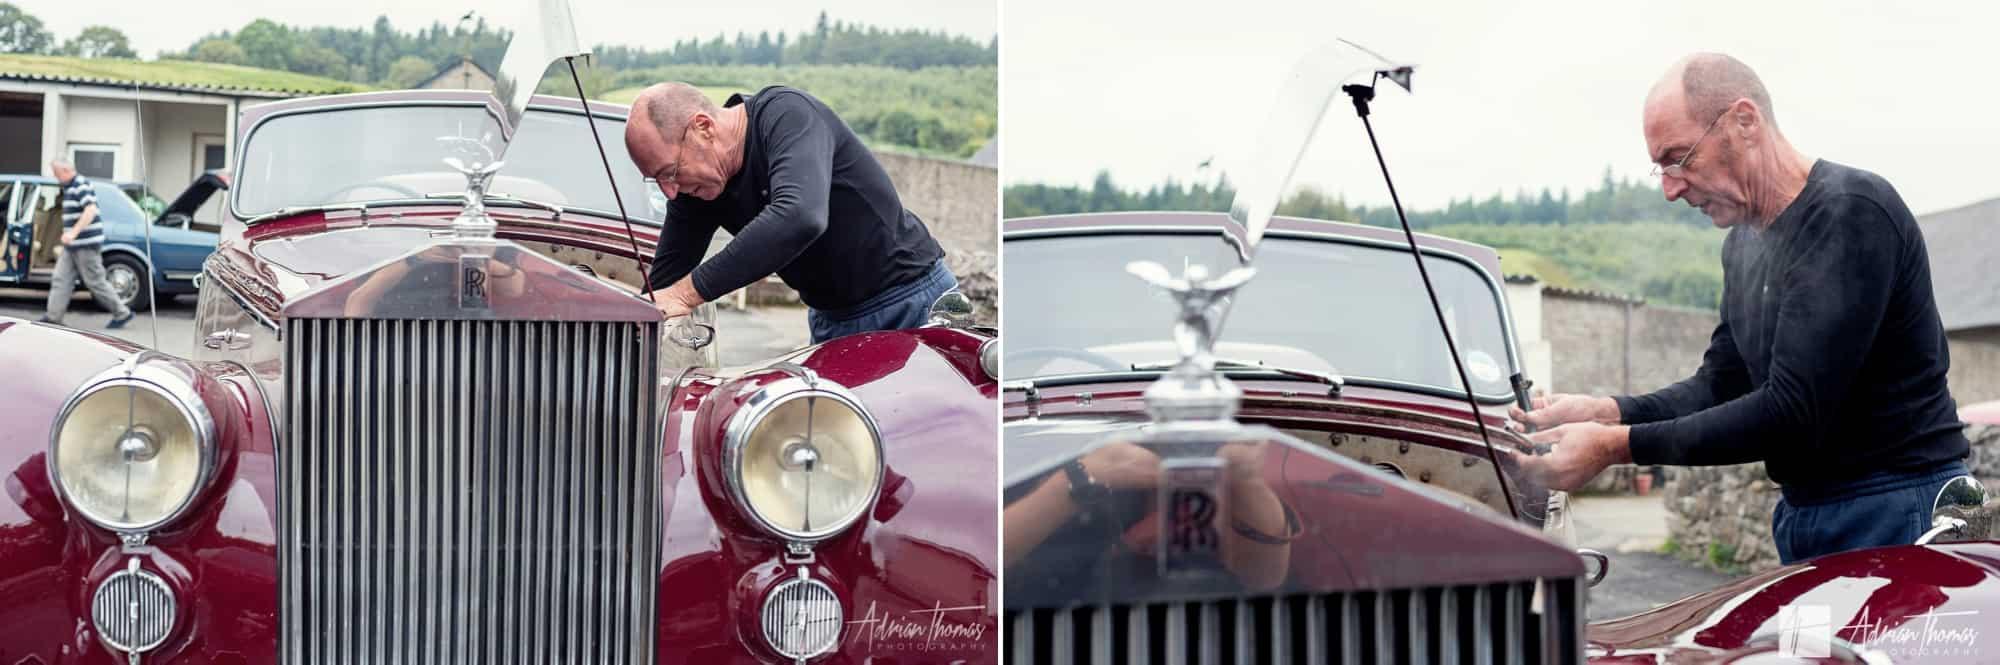 Wedding car engine service.